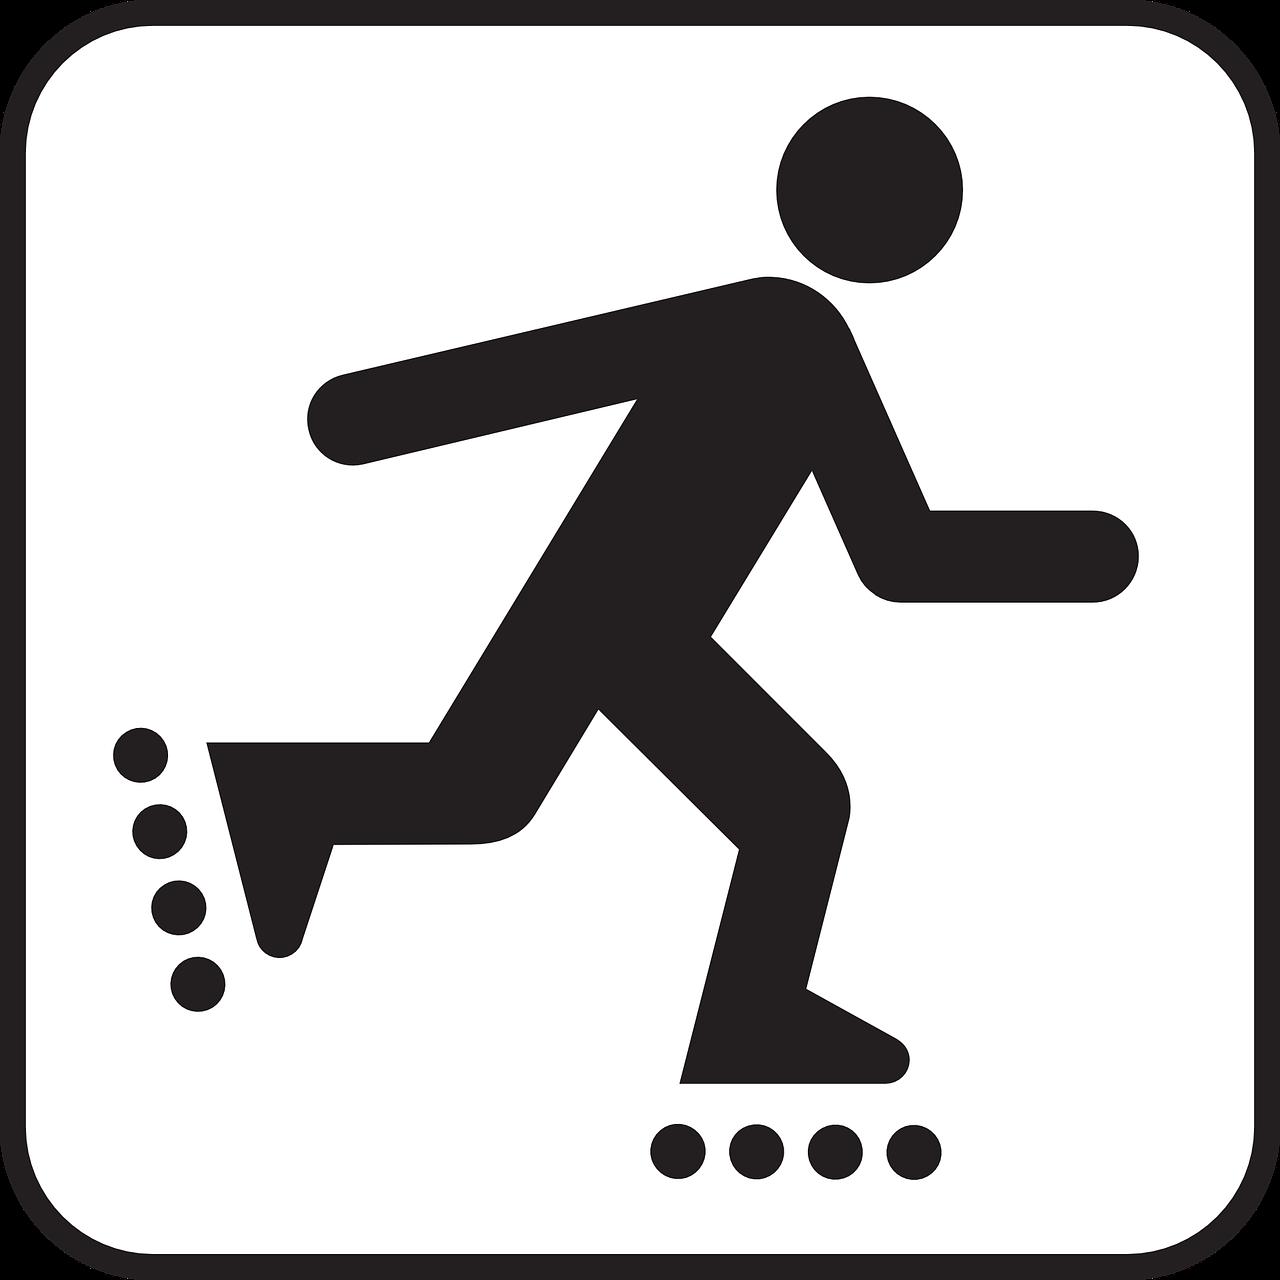 спорт символ картинка несколько